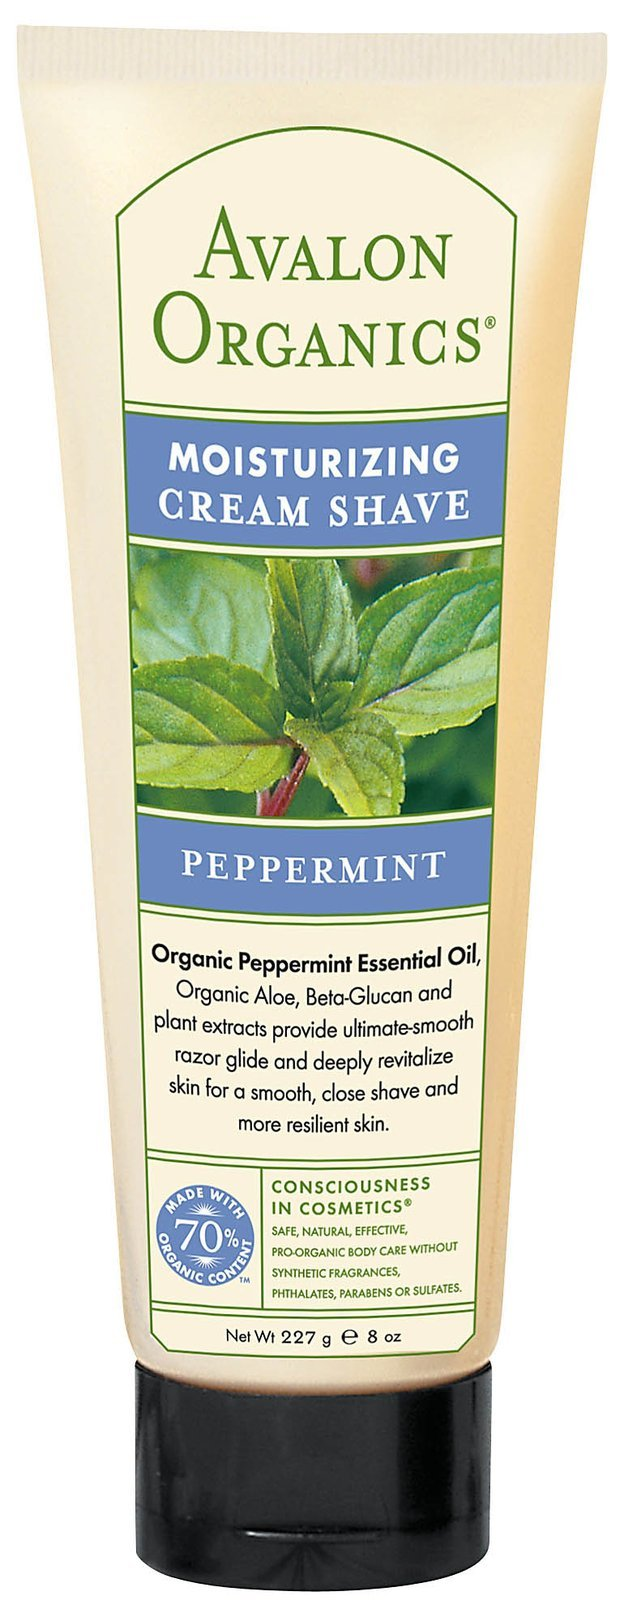 Avalon Organics Moisturizing Cream Shave, Peppermint 8 oz ( Pack of 8)